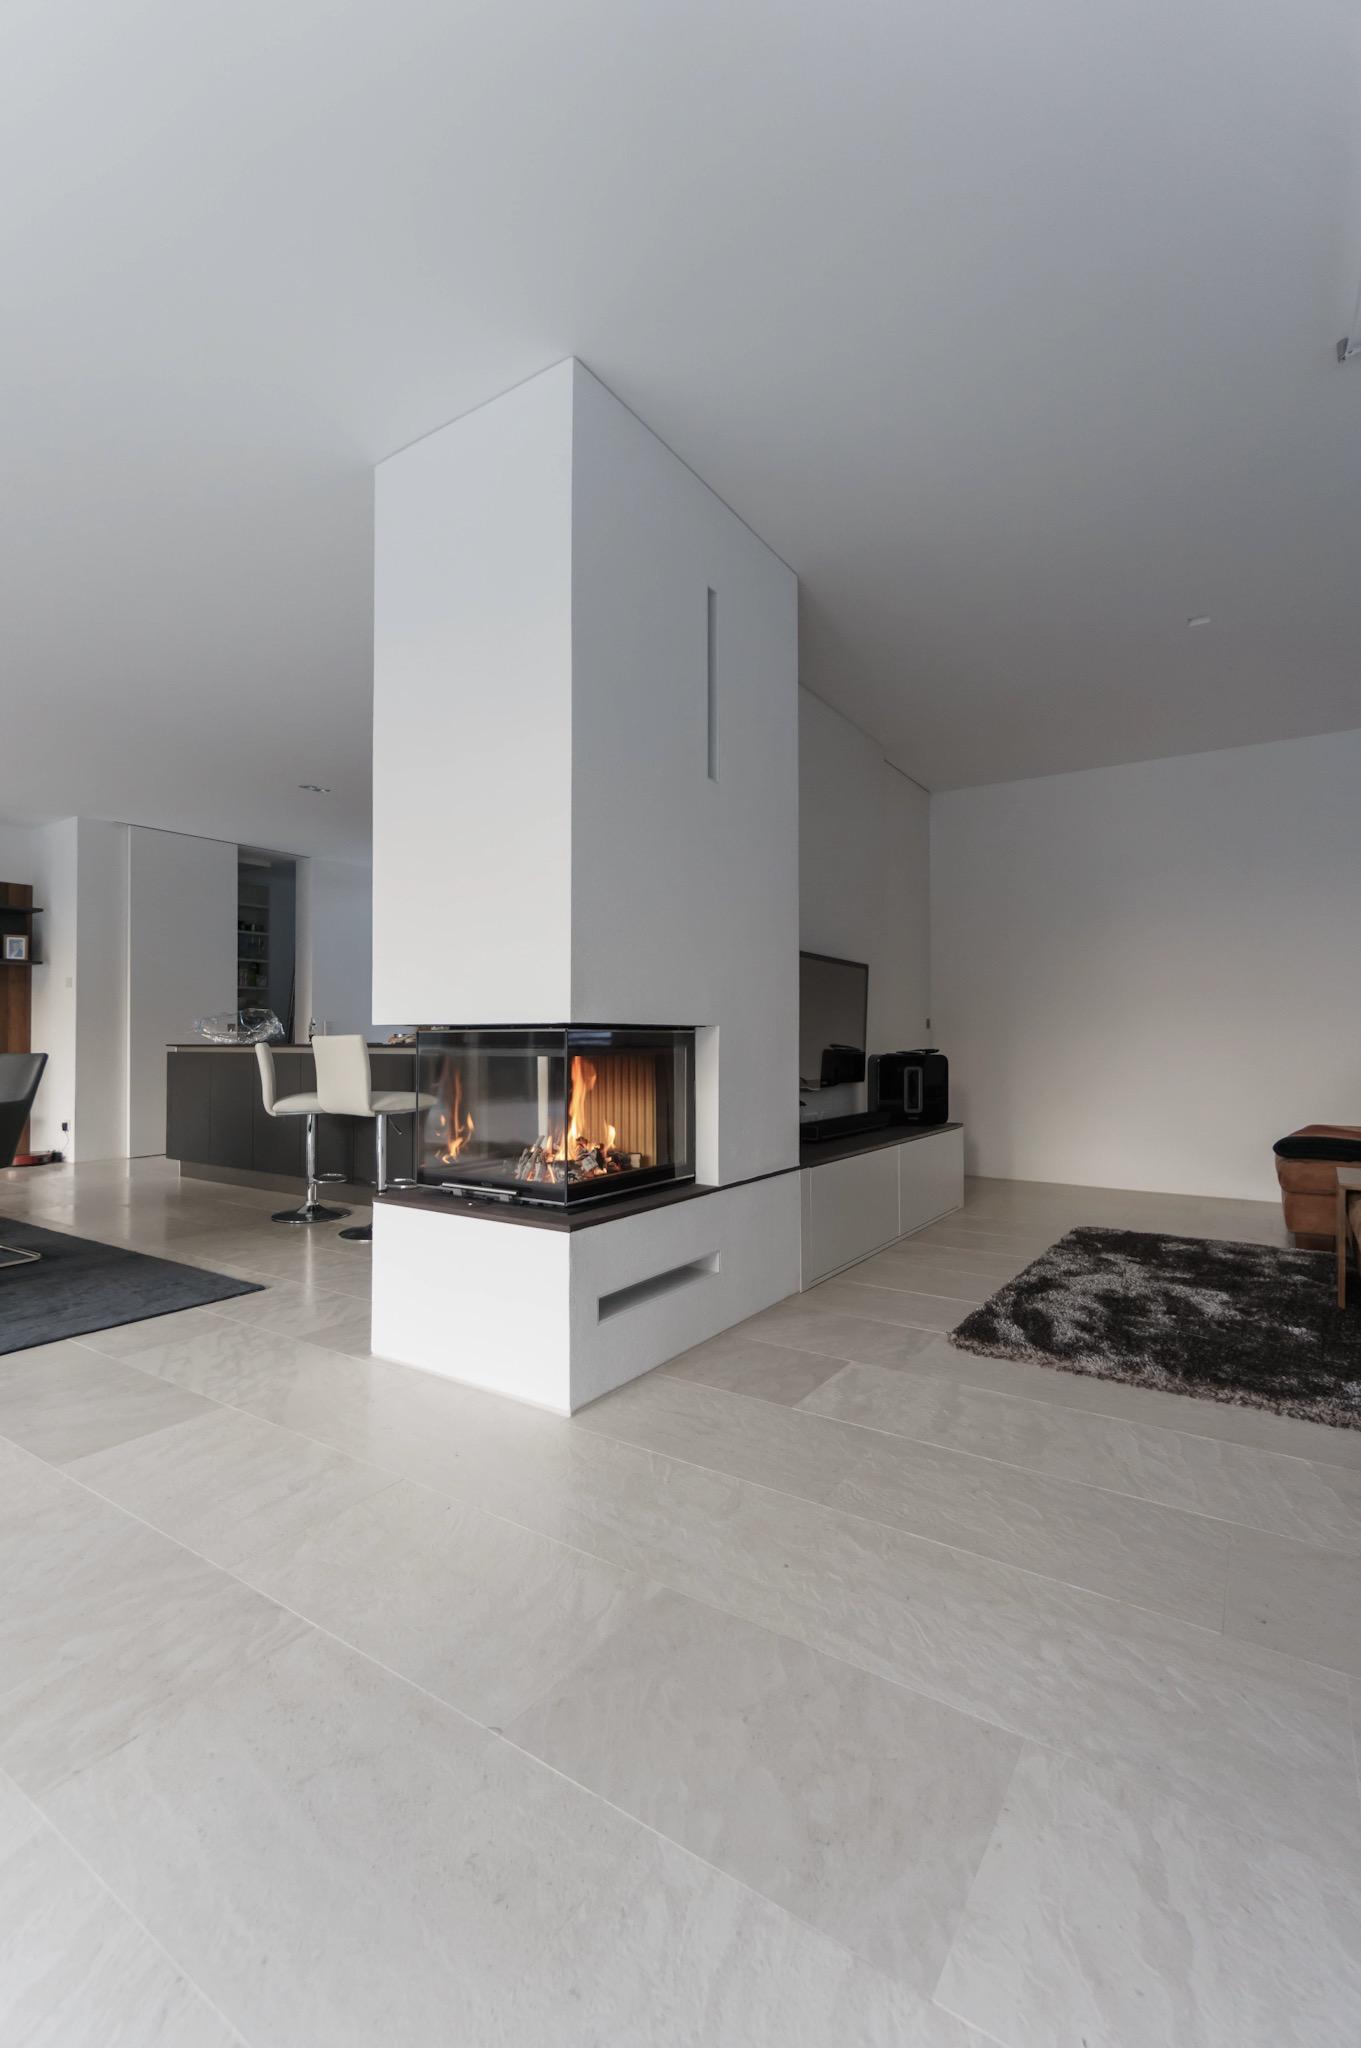 ofenbauer markus ehrmann kachelofen 97215 uffenheim hagos. Black Bedroom Furniture Sets. Home Design Ideas